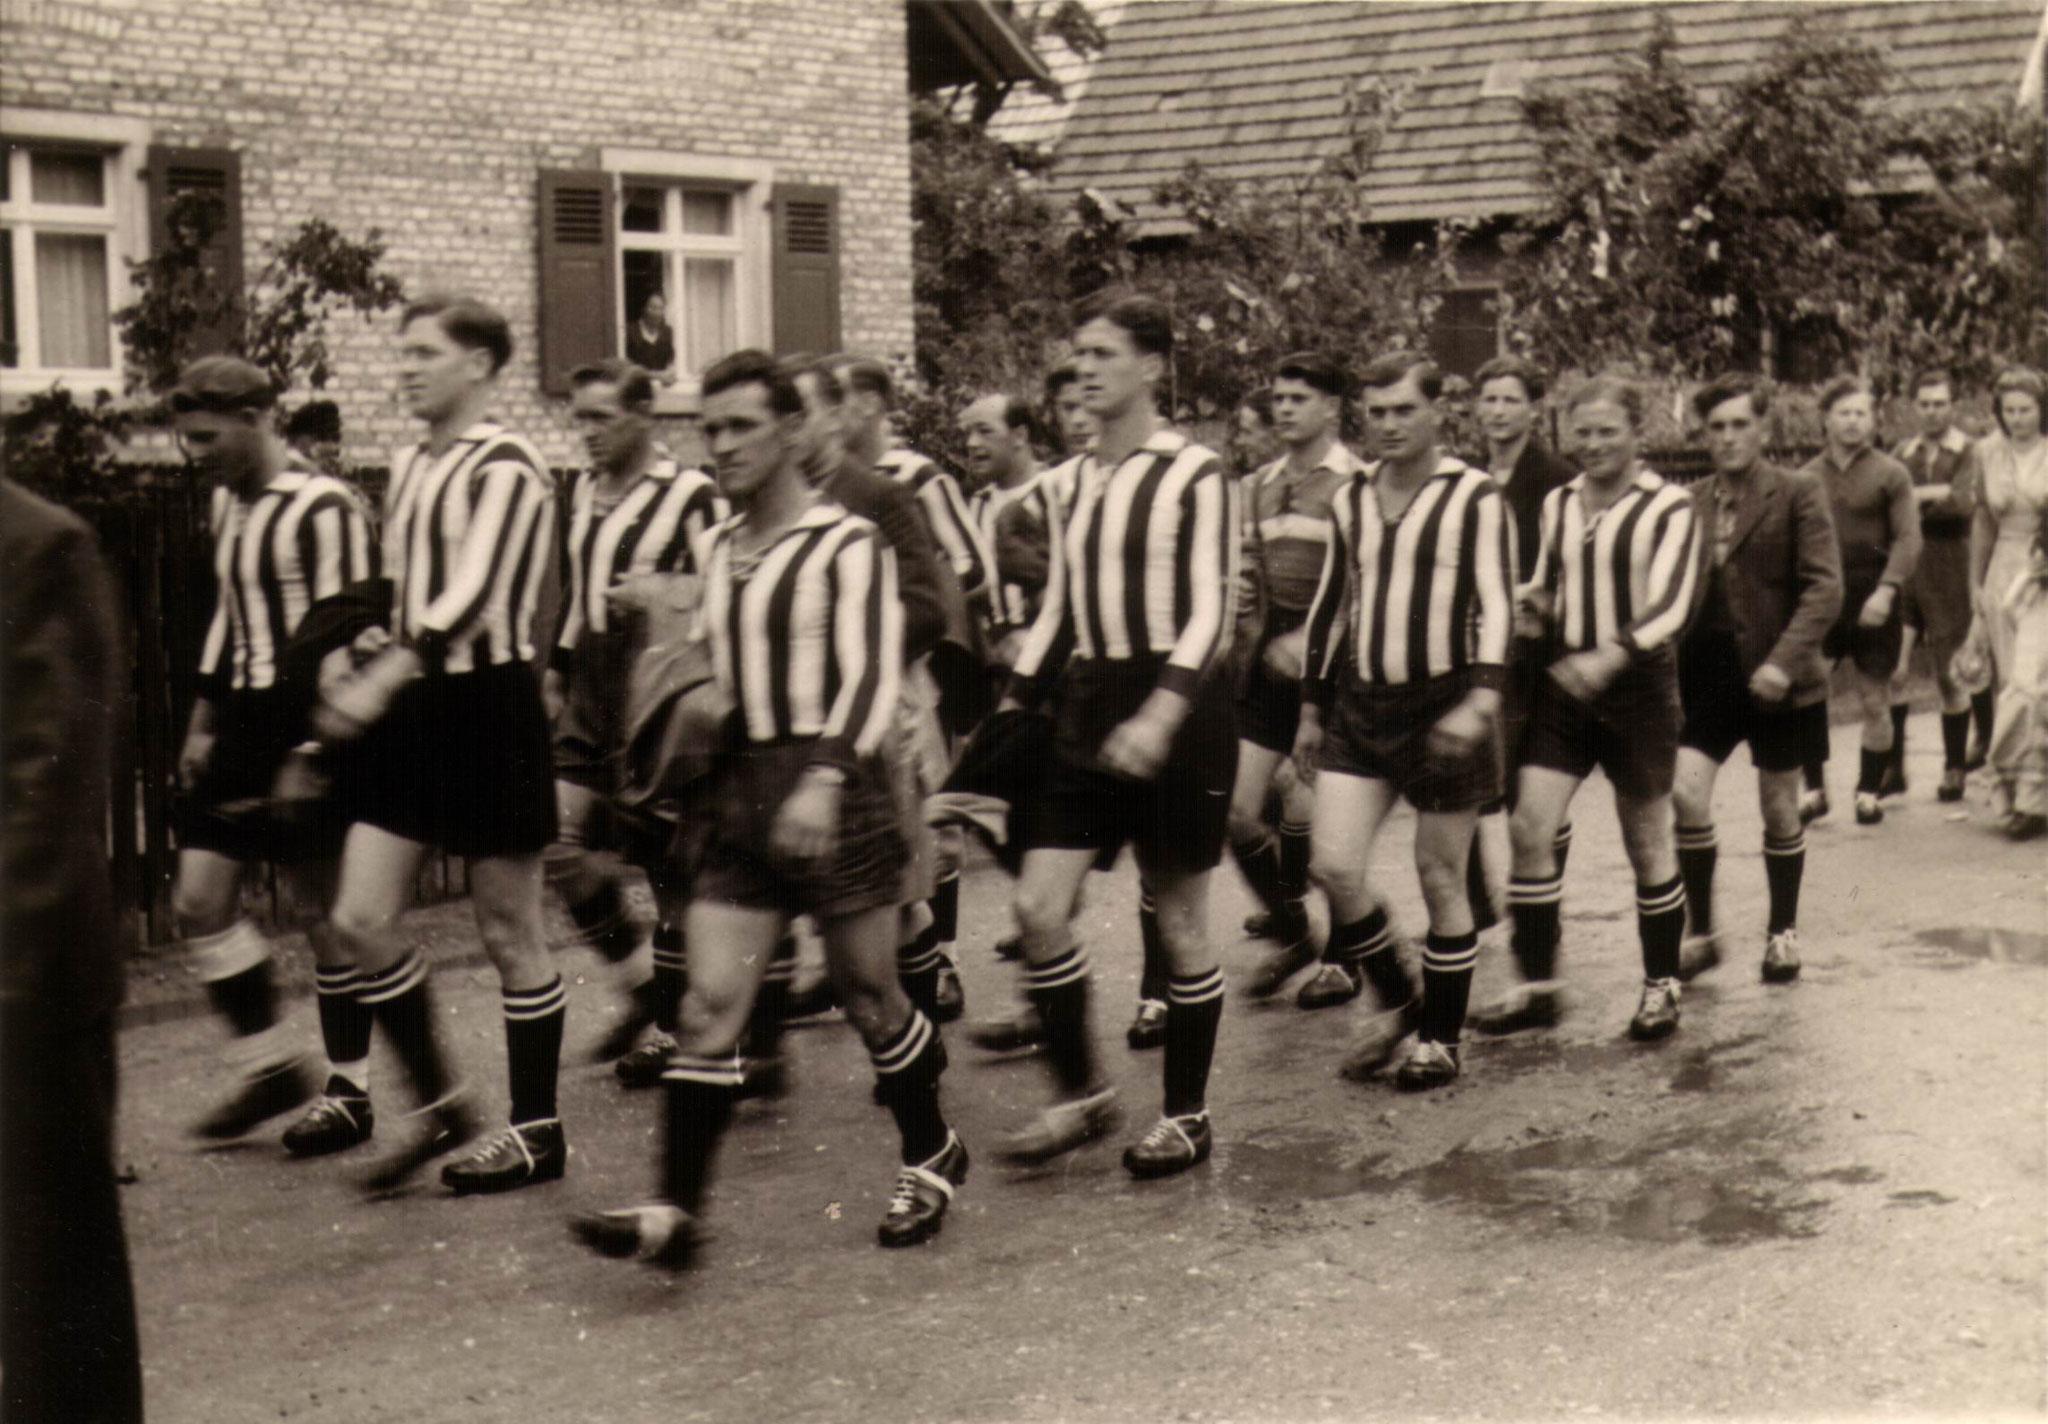 Sportfest 1948 -  Umzug durchs   Dorf